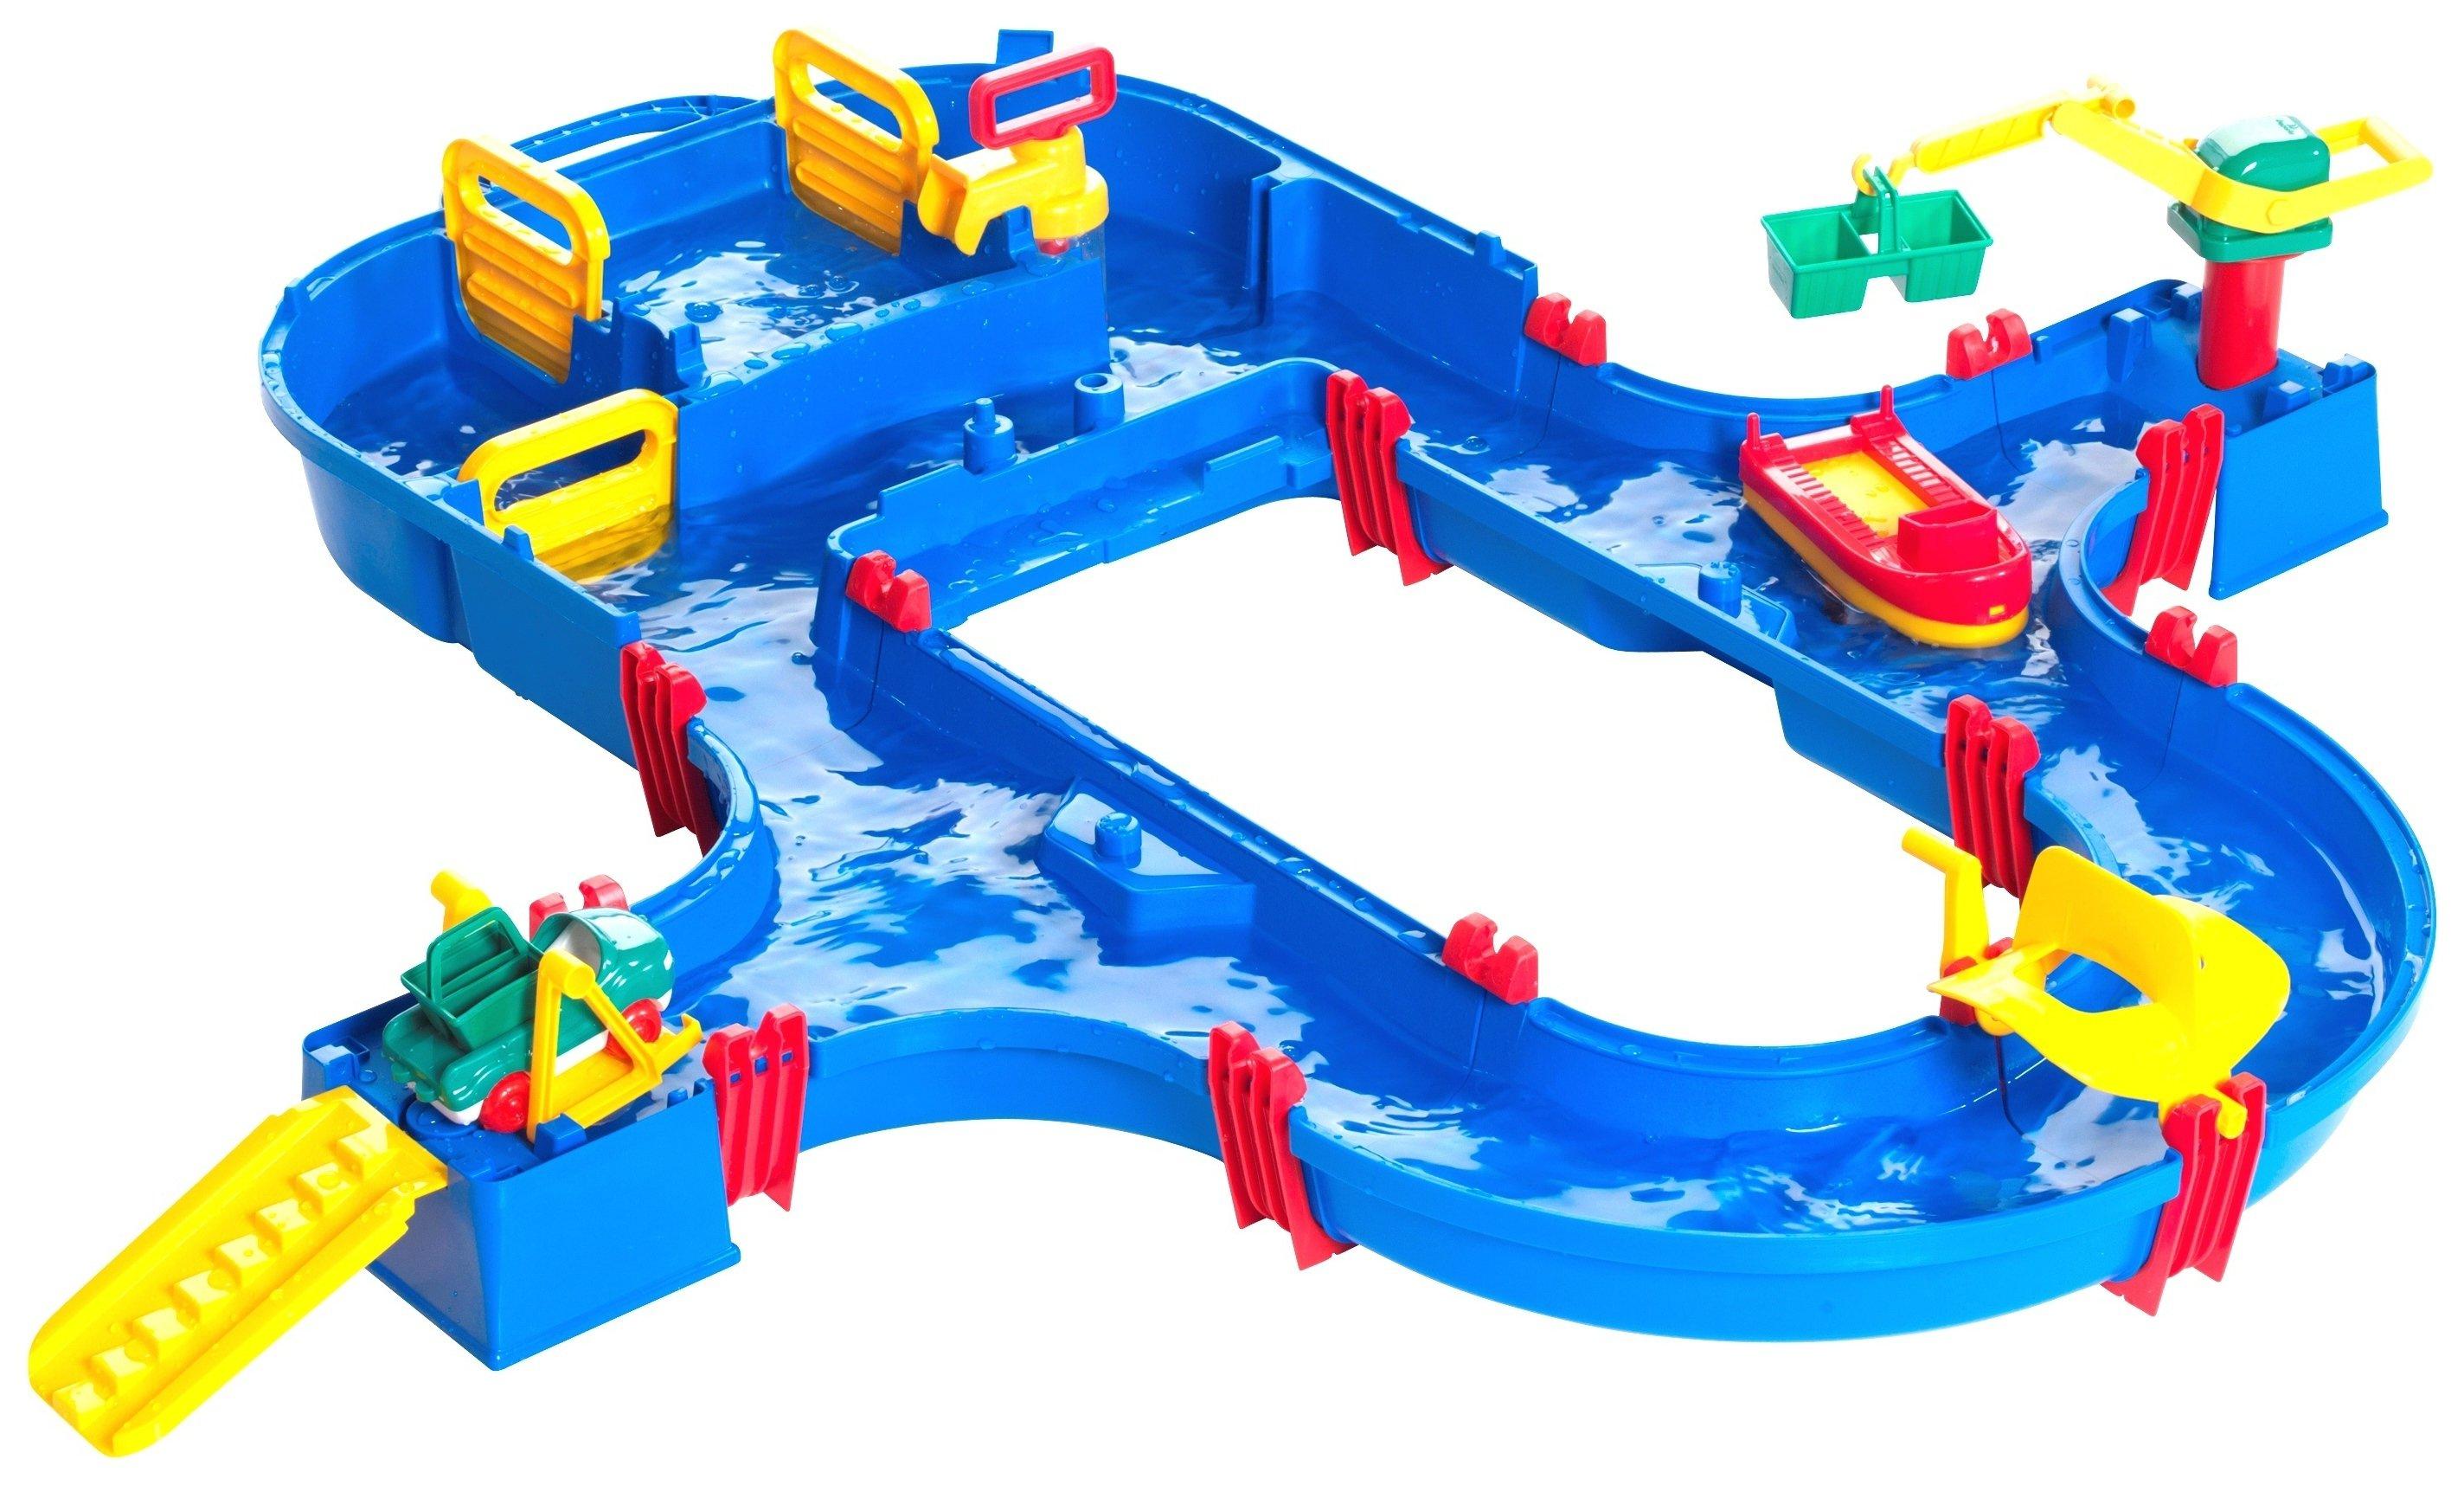 Image of Aqua Play Superset.